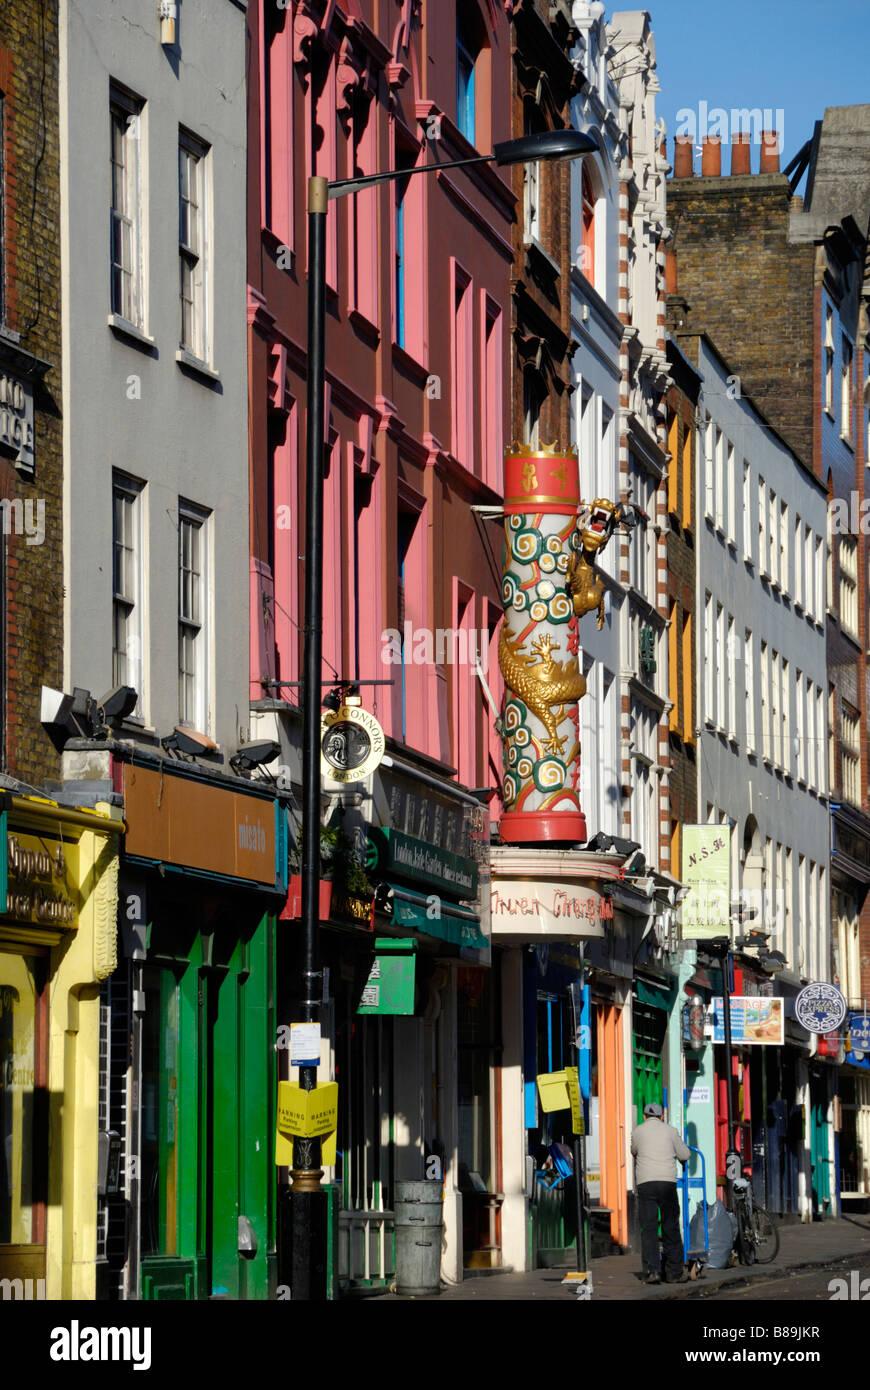 Wardour Street Chinatown London England - Stock Image